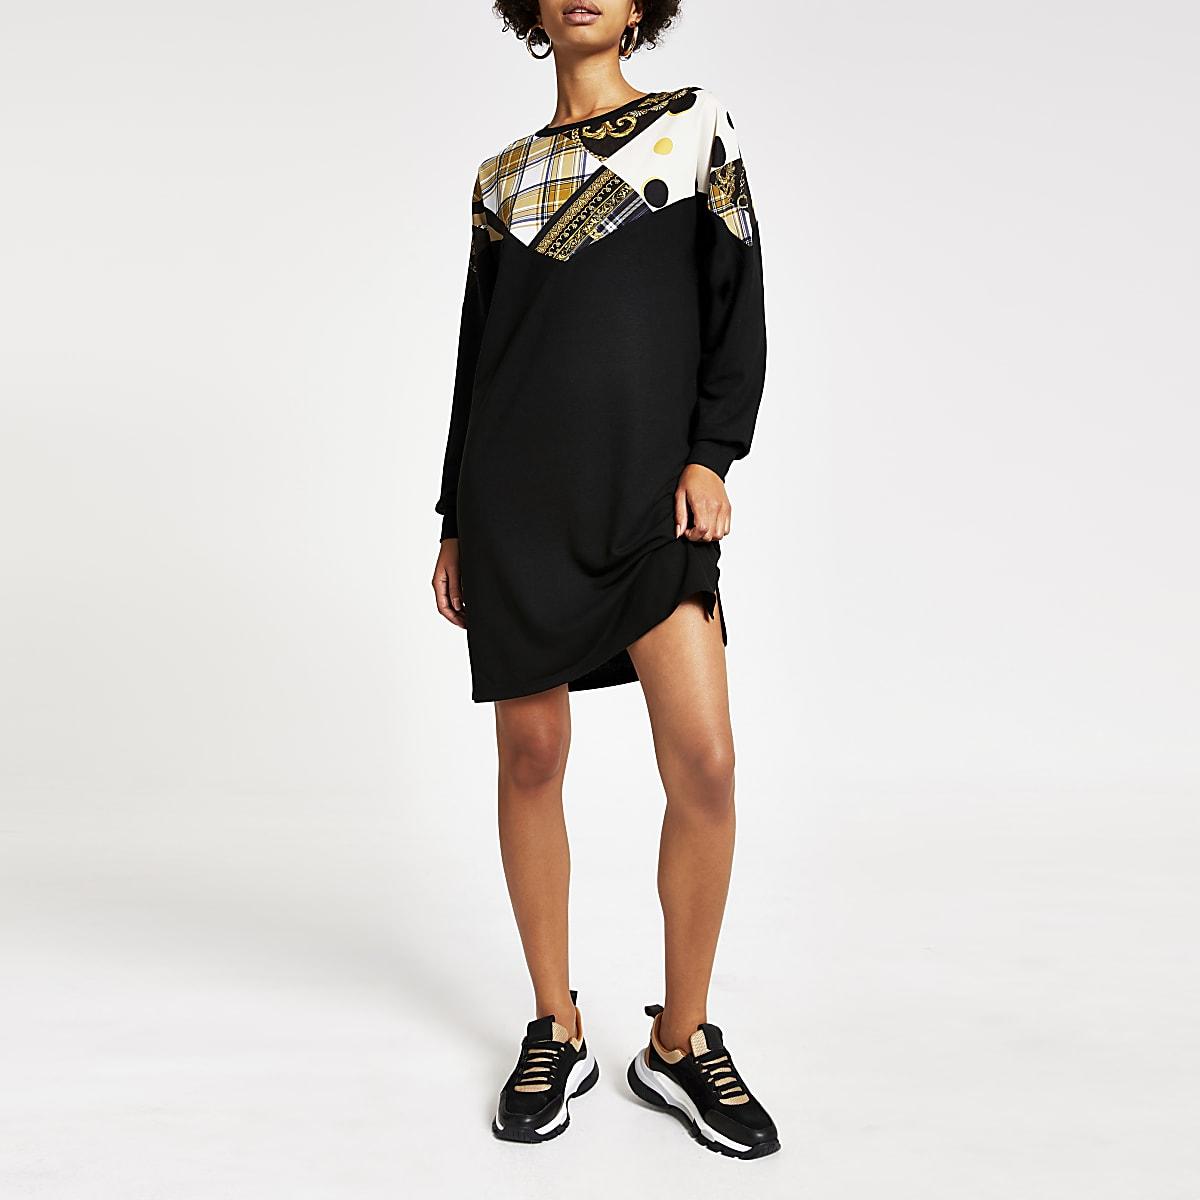 Zwarte sweatshirt-jurk met RI-monogram